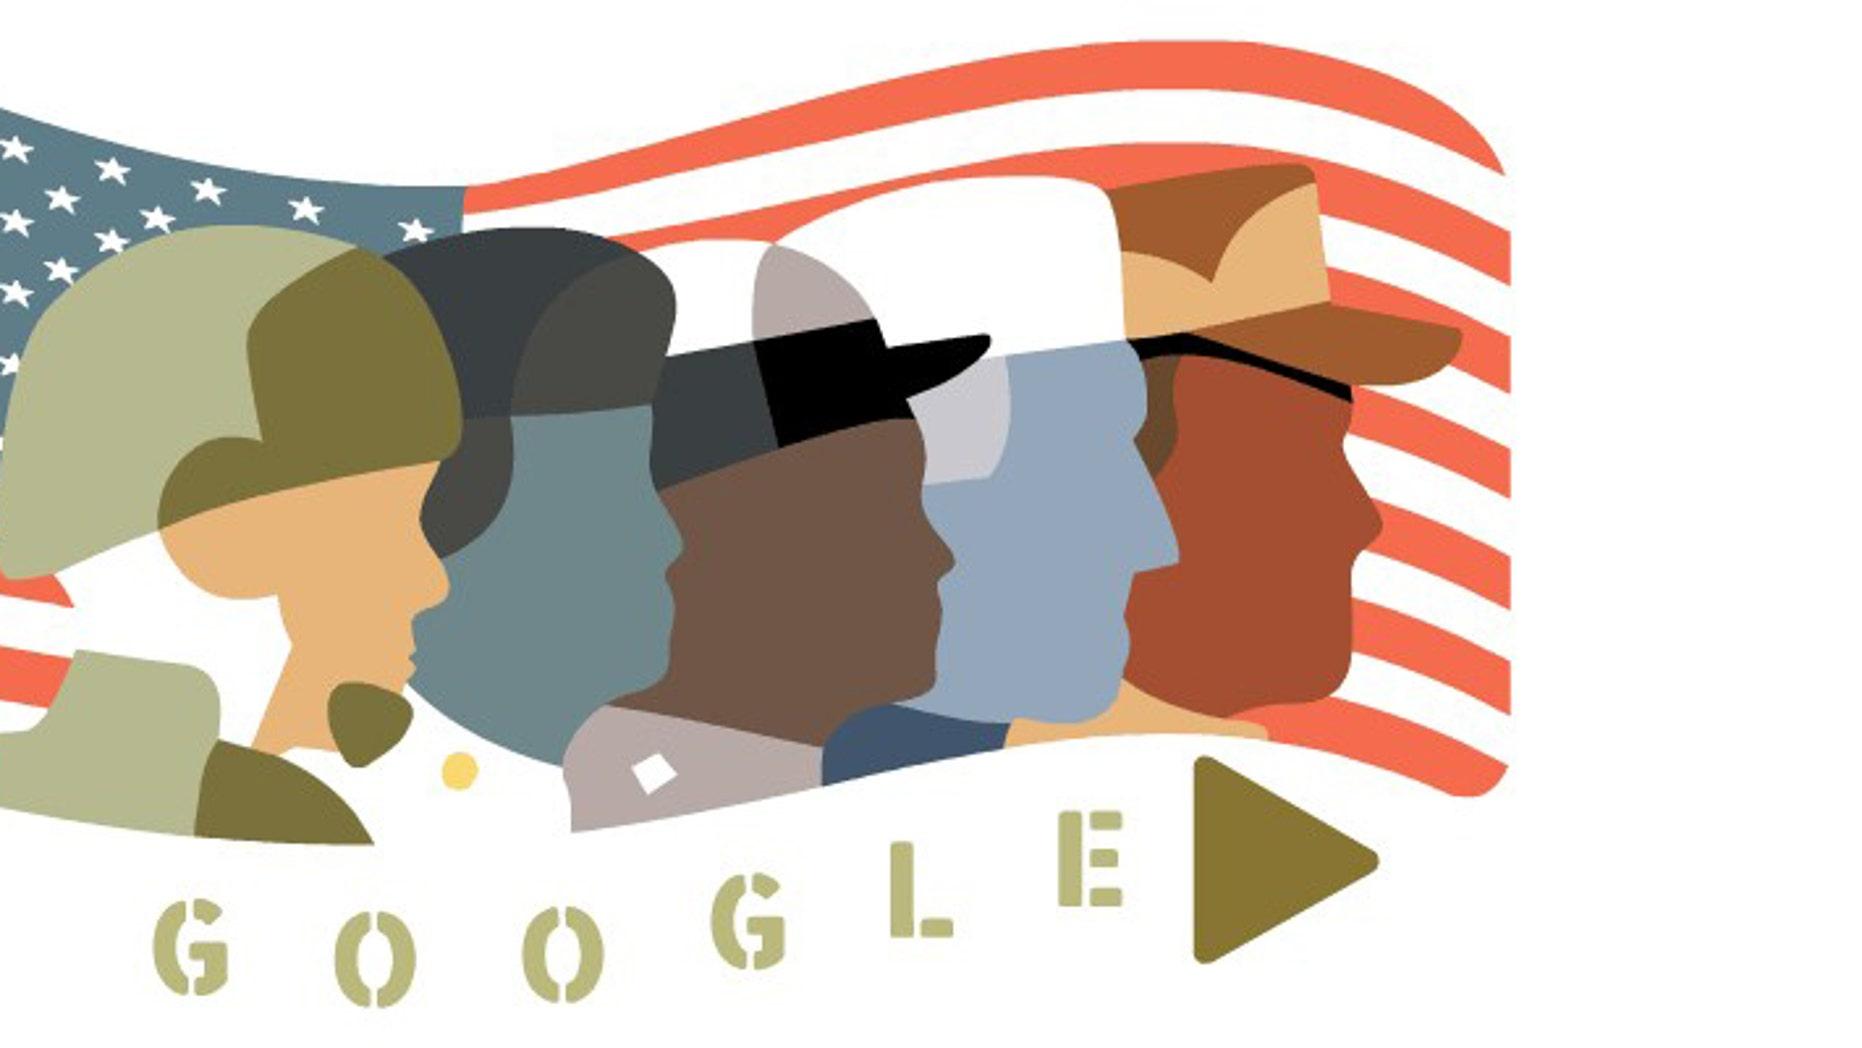 Google Veteran's Day Doodle (Google)